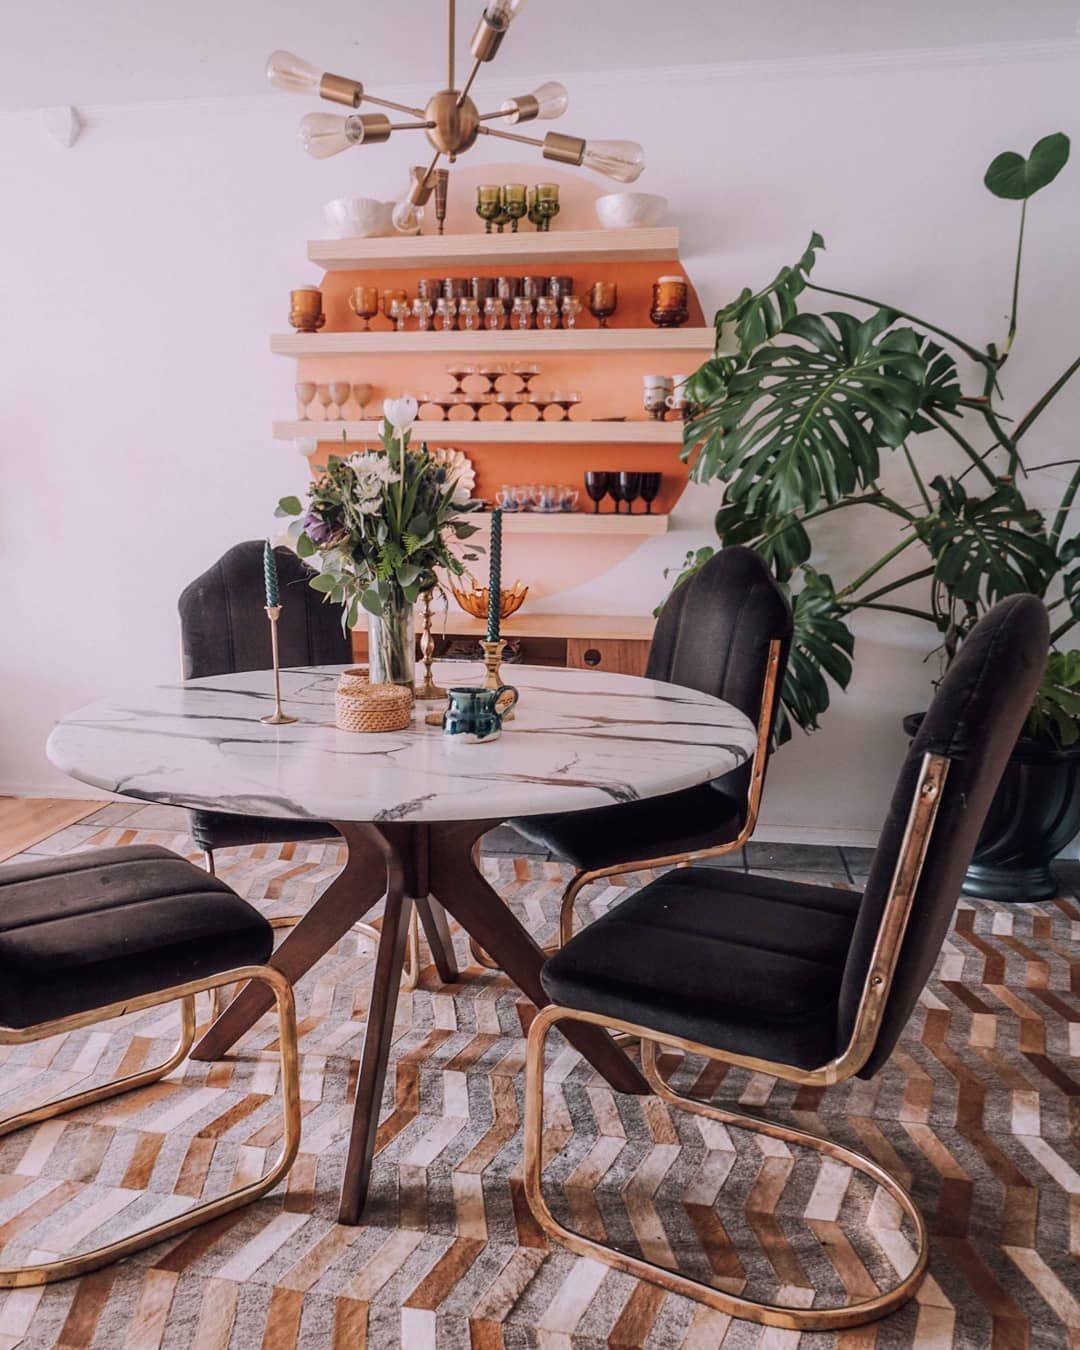 stephen dining table bohemian house decor bohemian decor home decor on boho chic kitchen table id=37051